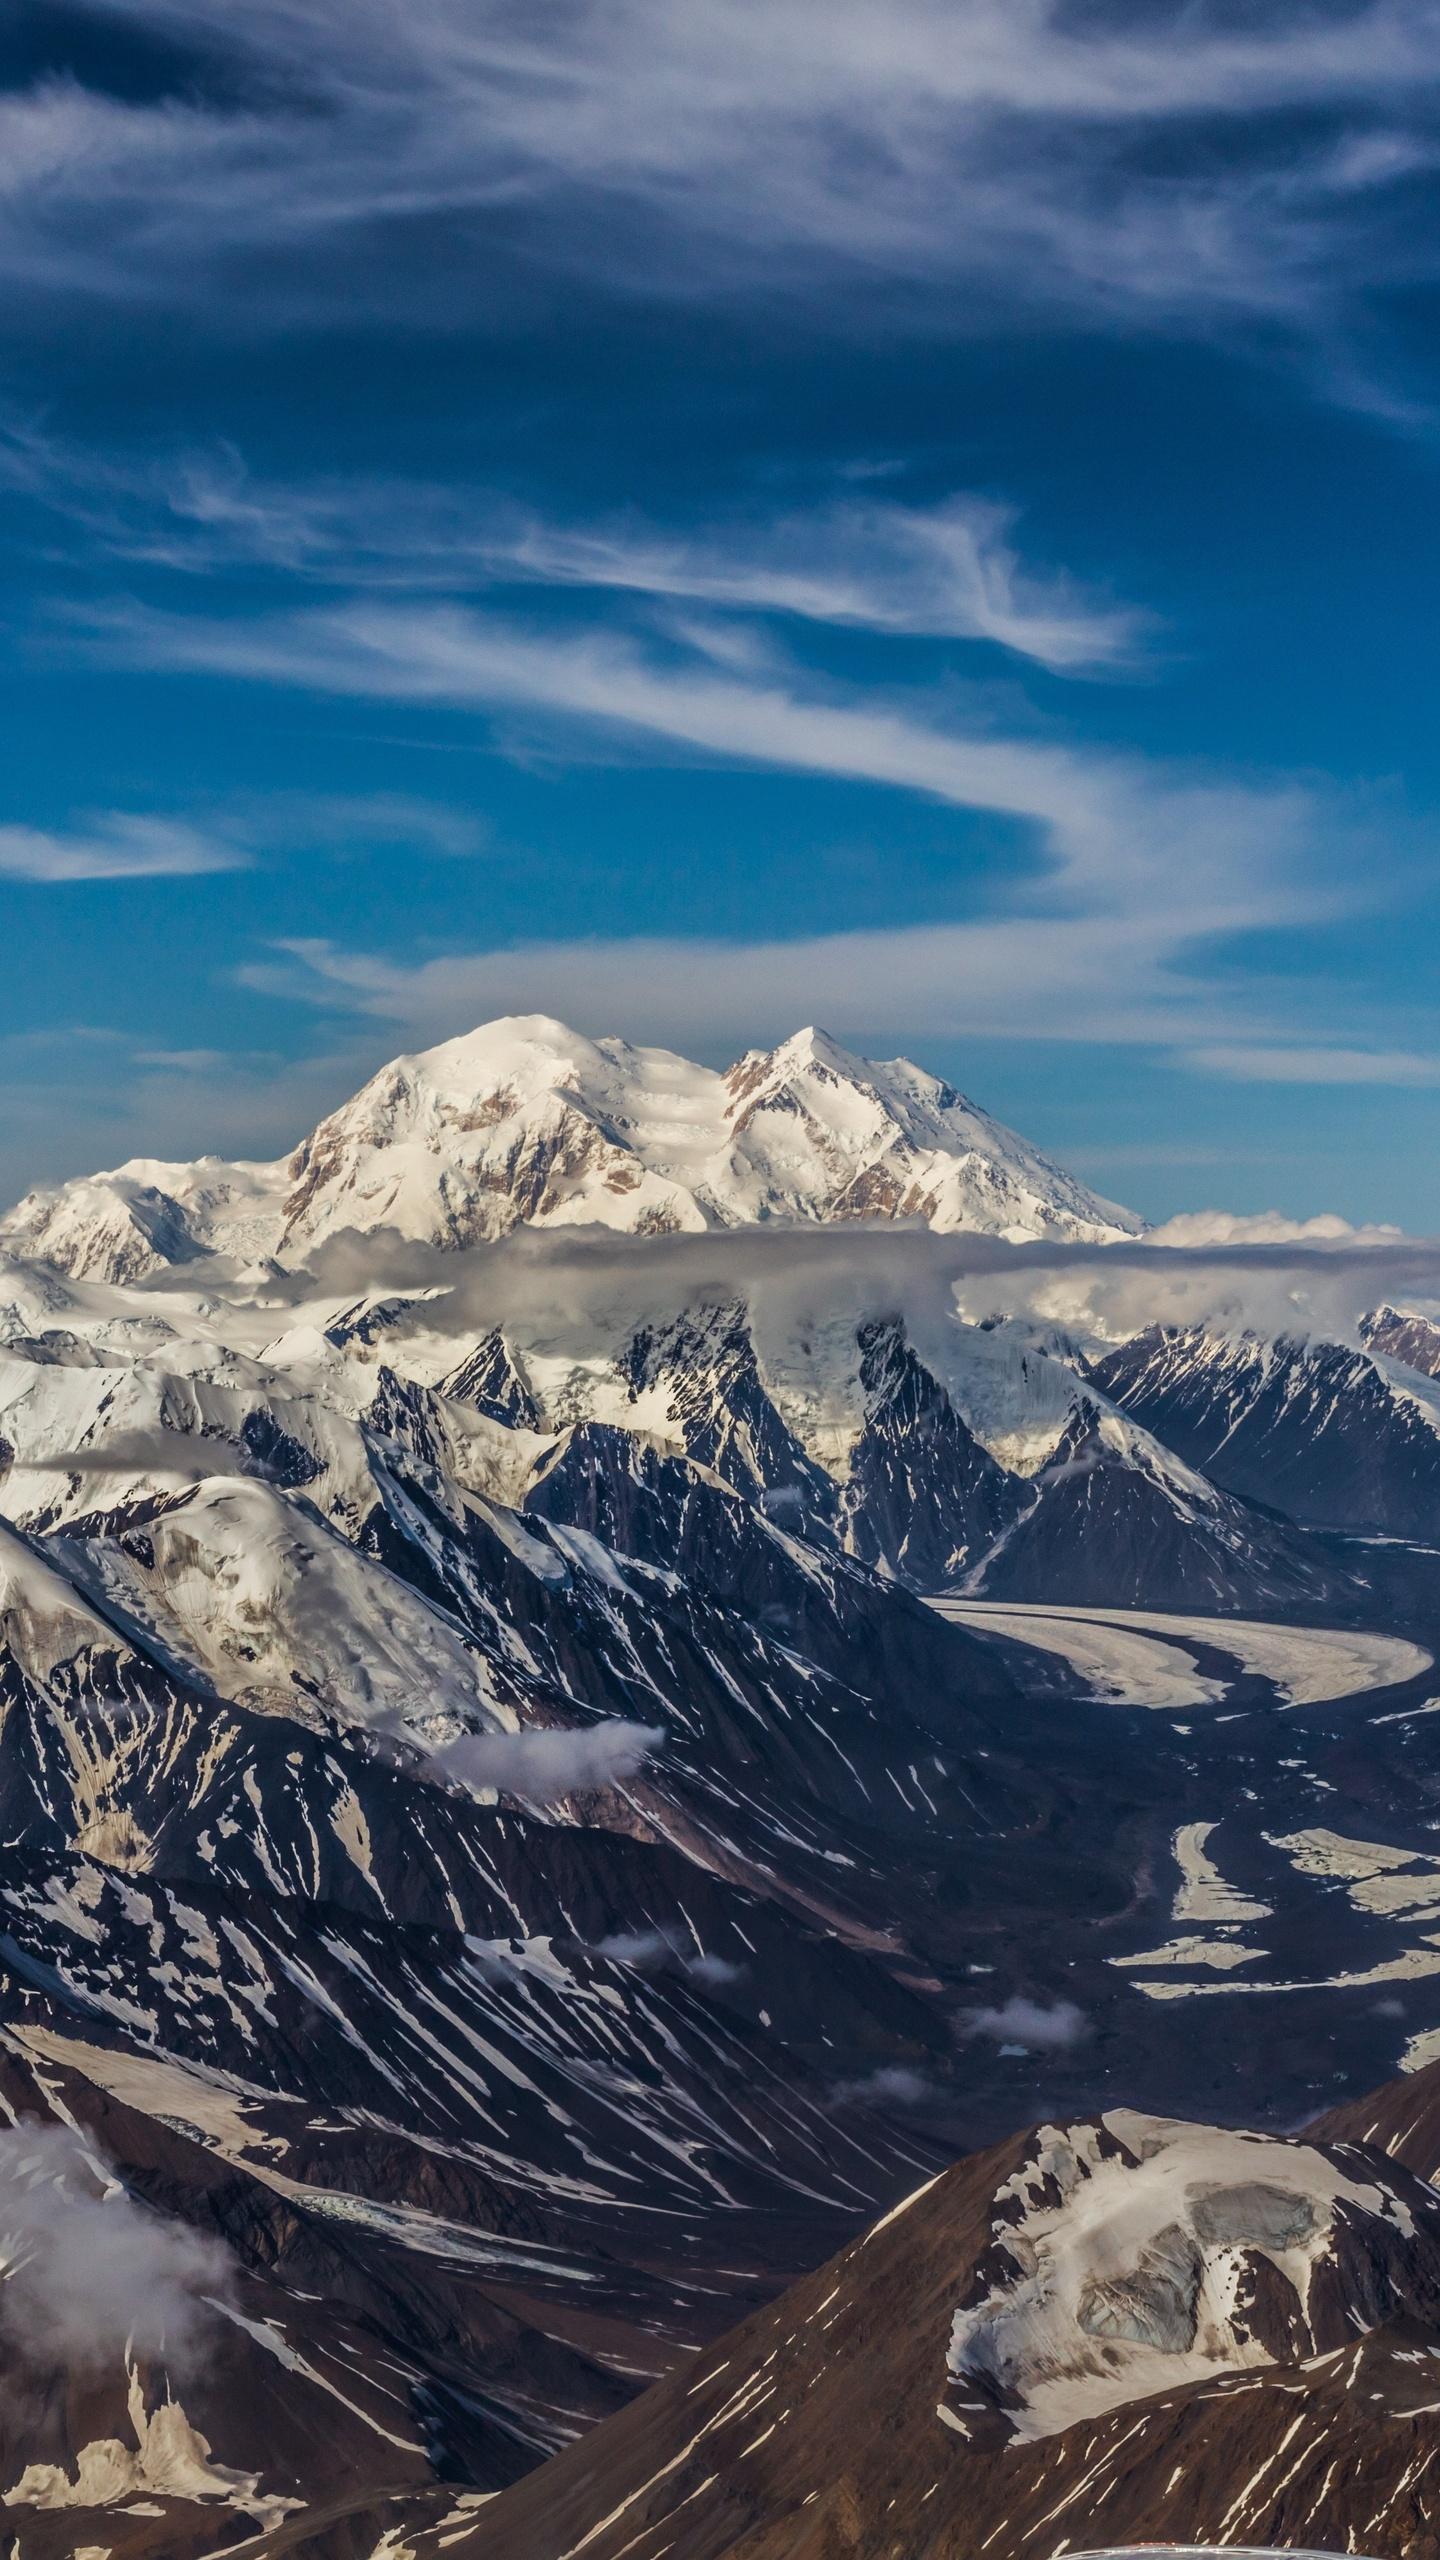 snow-mountains-landscape-panamoric-clouds-8k-k9.jpg